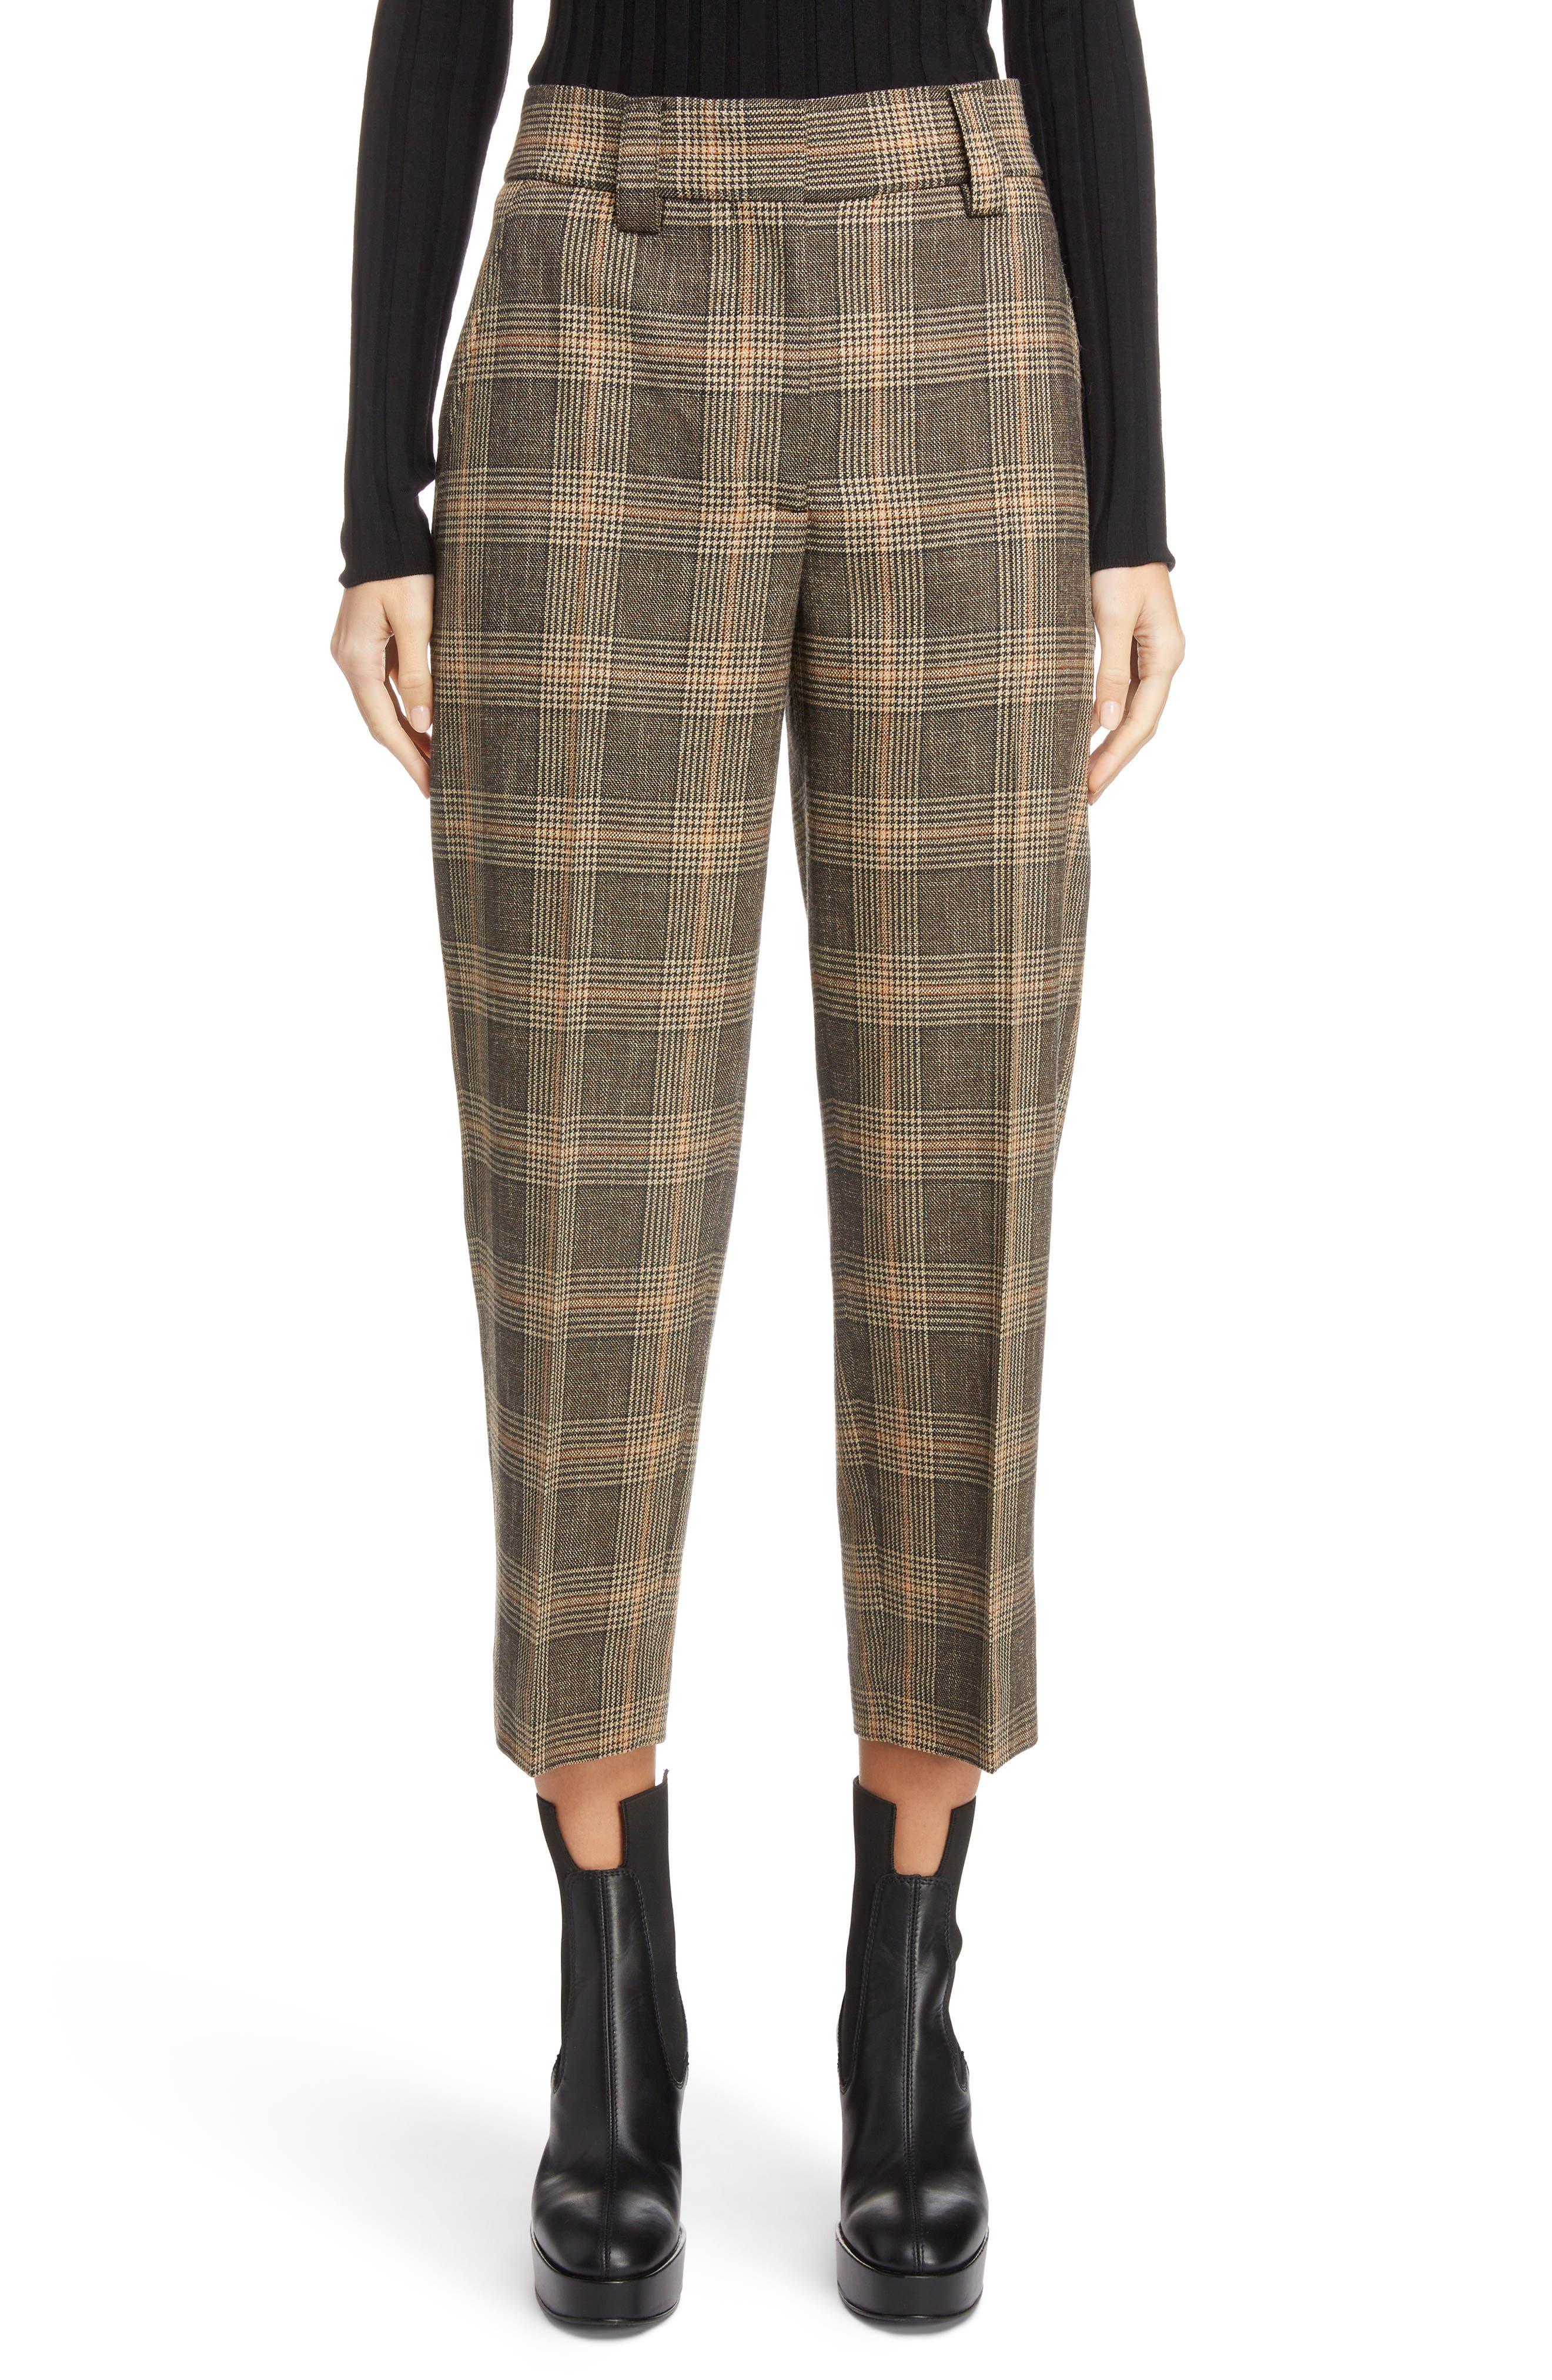 ddf57db1edd Acne Studios Tapered Trousers Brown Beige